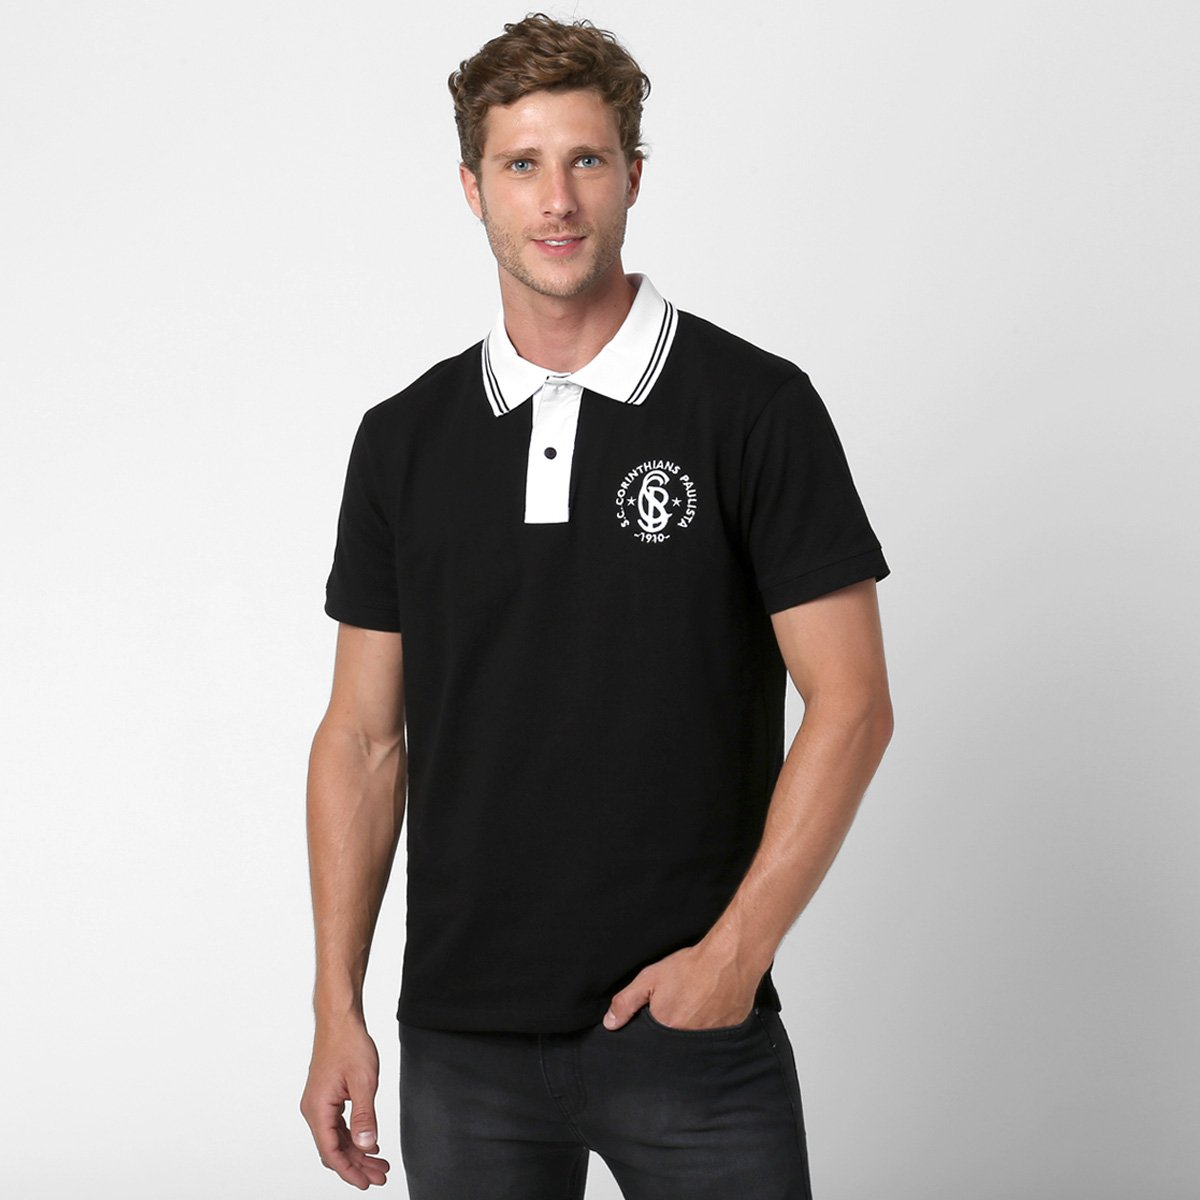 5d1cd86273543 Camisa Polo Corinthians Glórias Masculina - Compre Agora